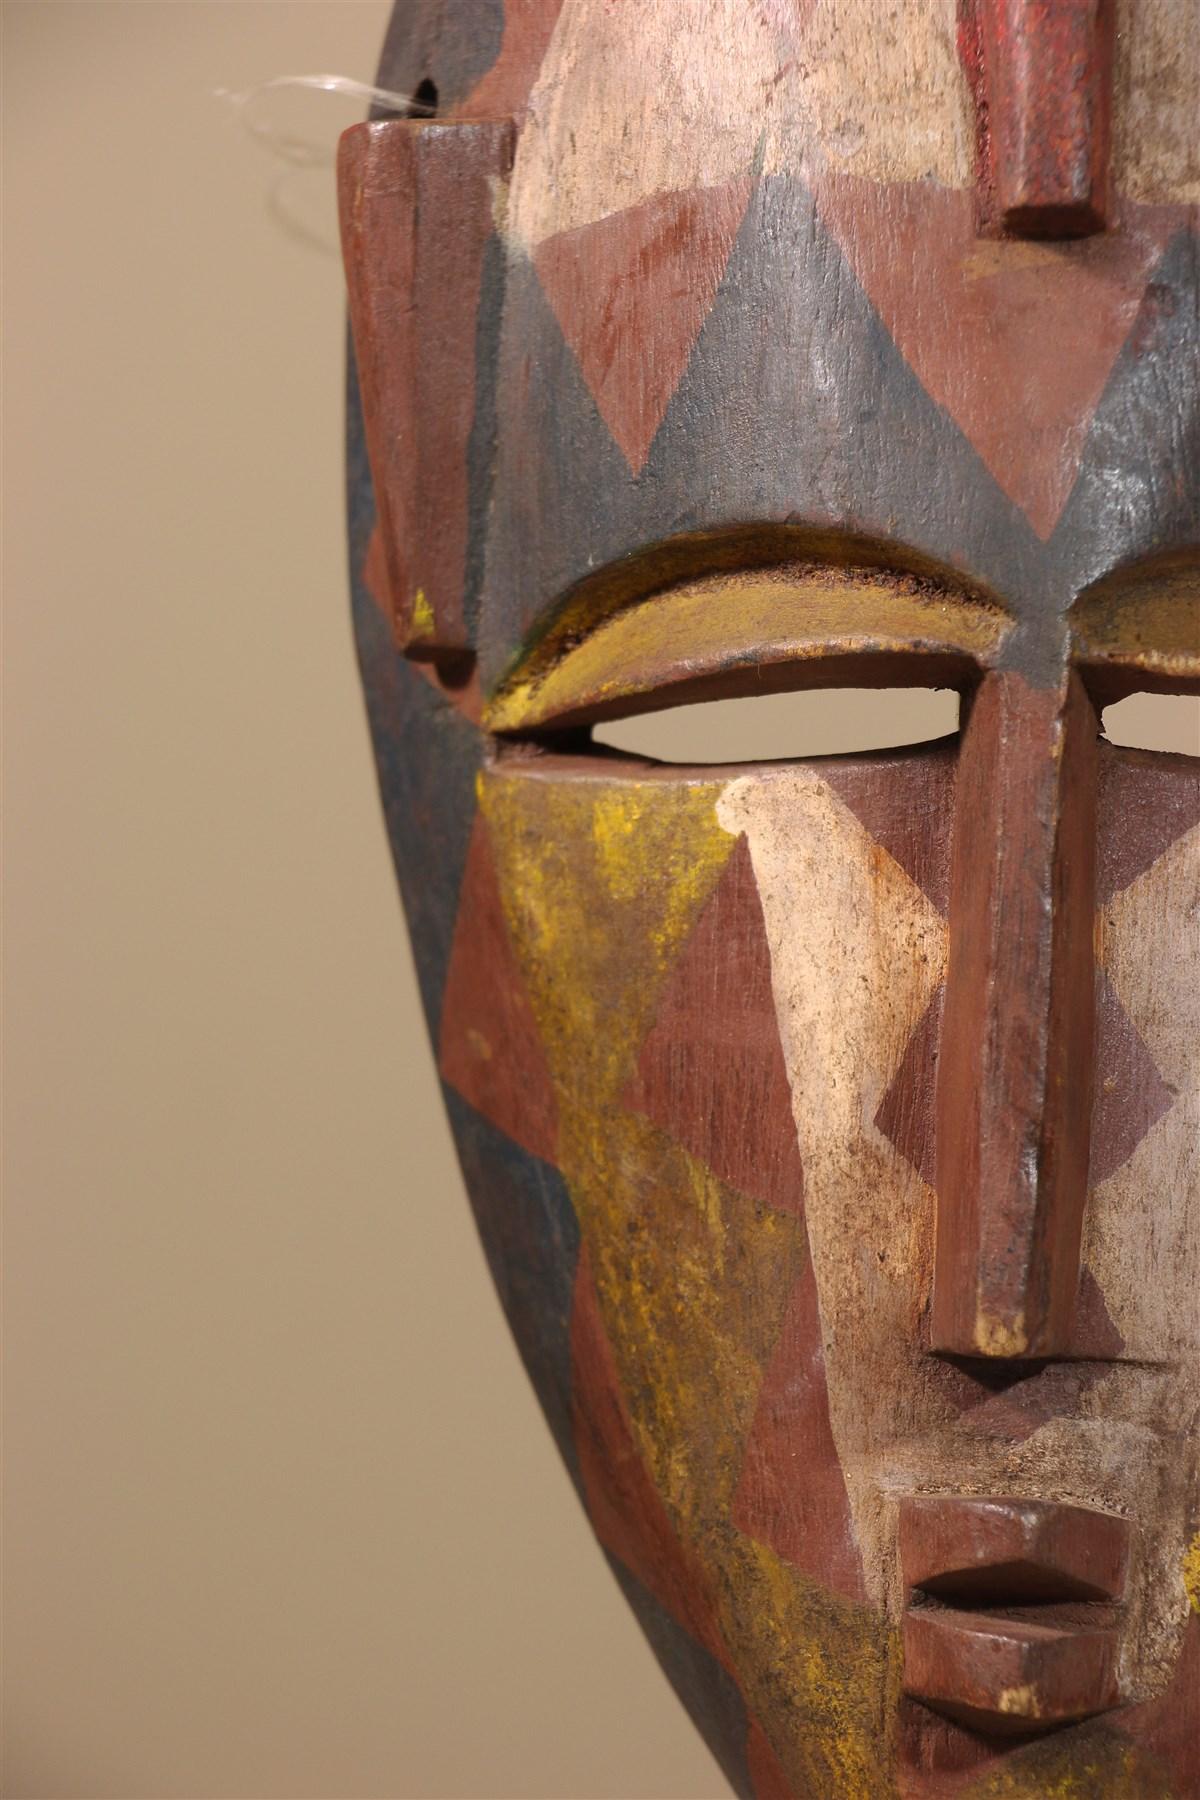 Masque africain Markha, Warka du Mali - Déco africaine - Art africain traditionnel